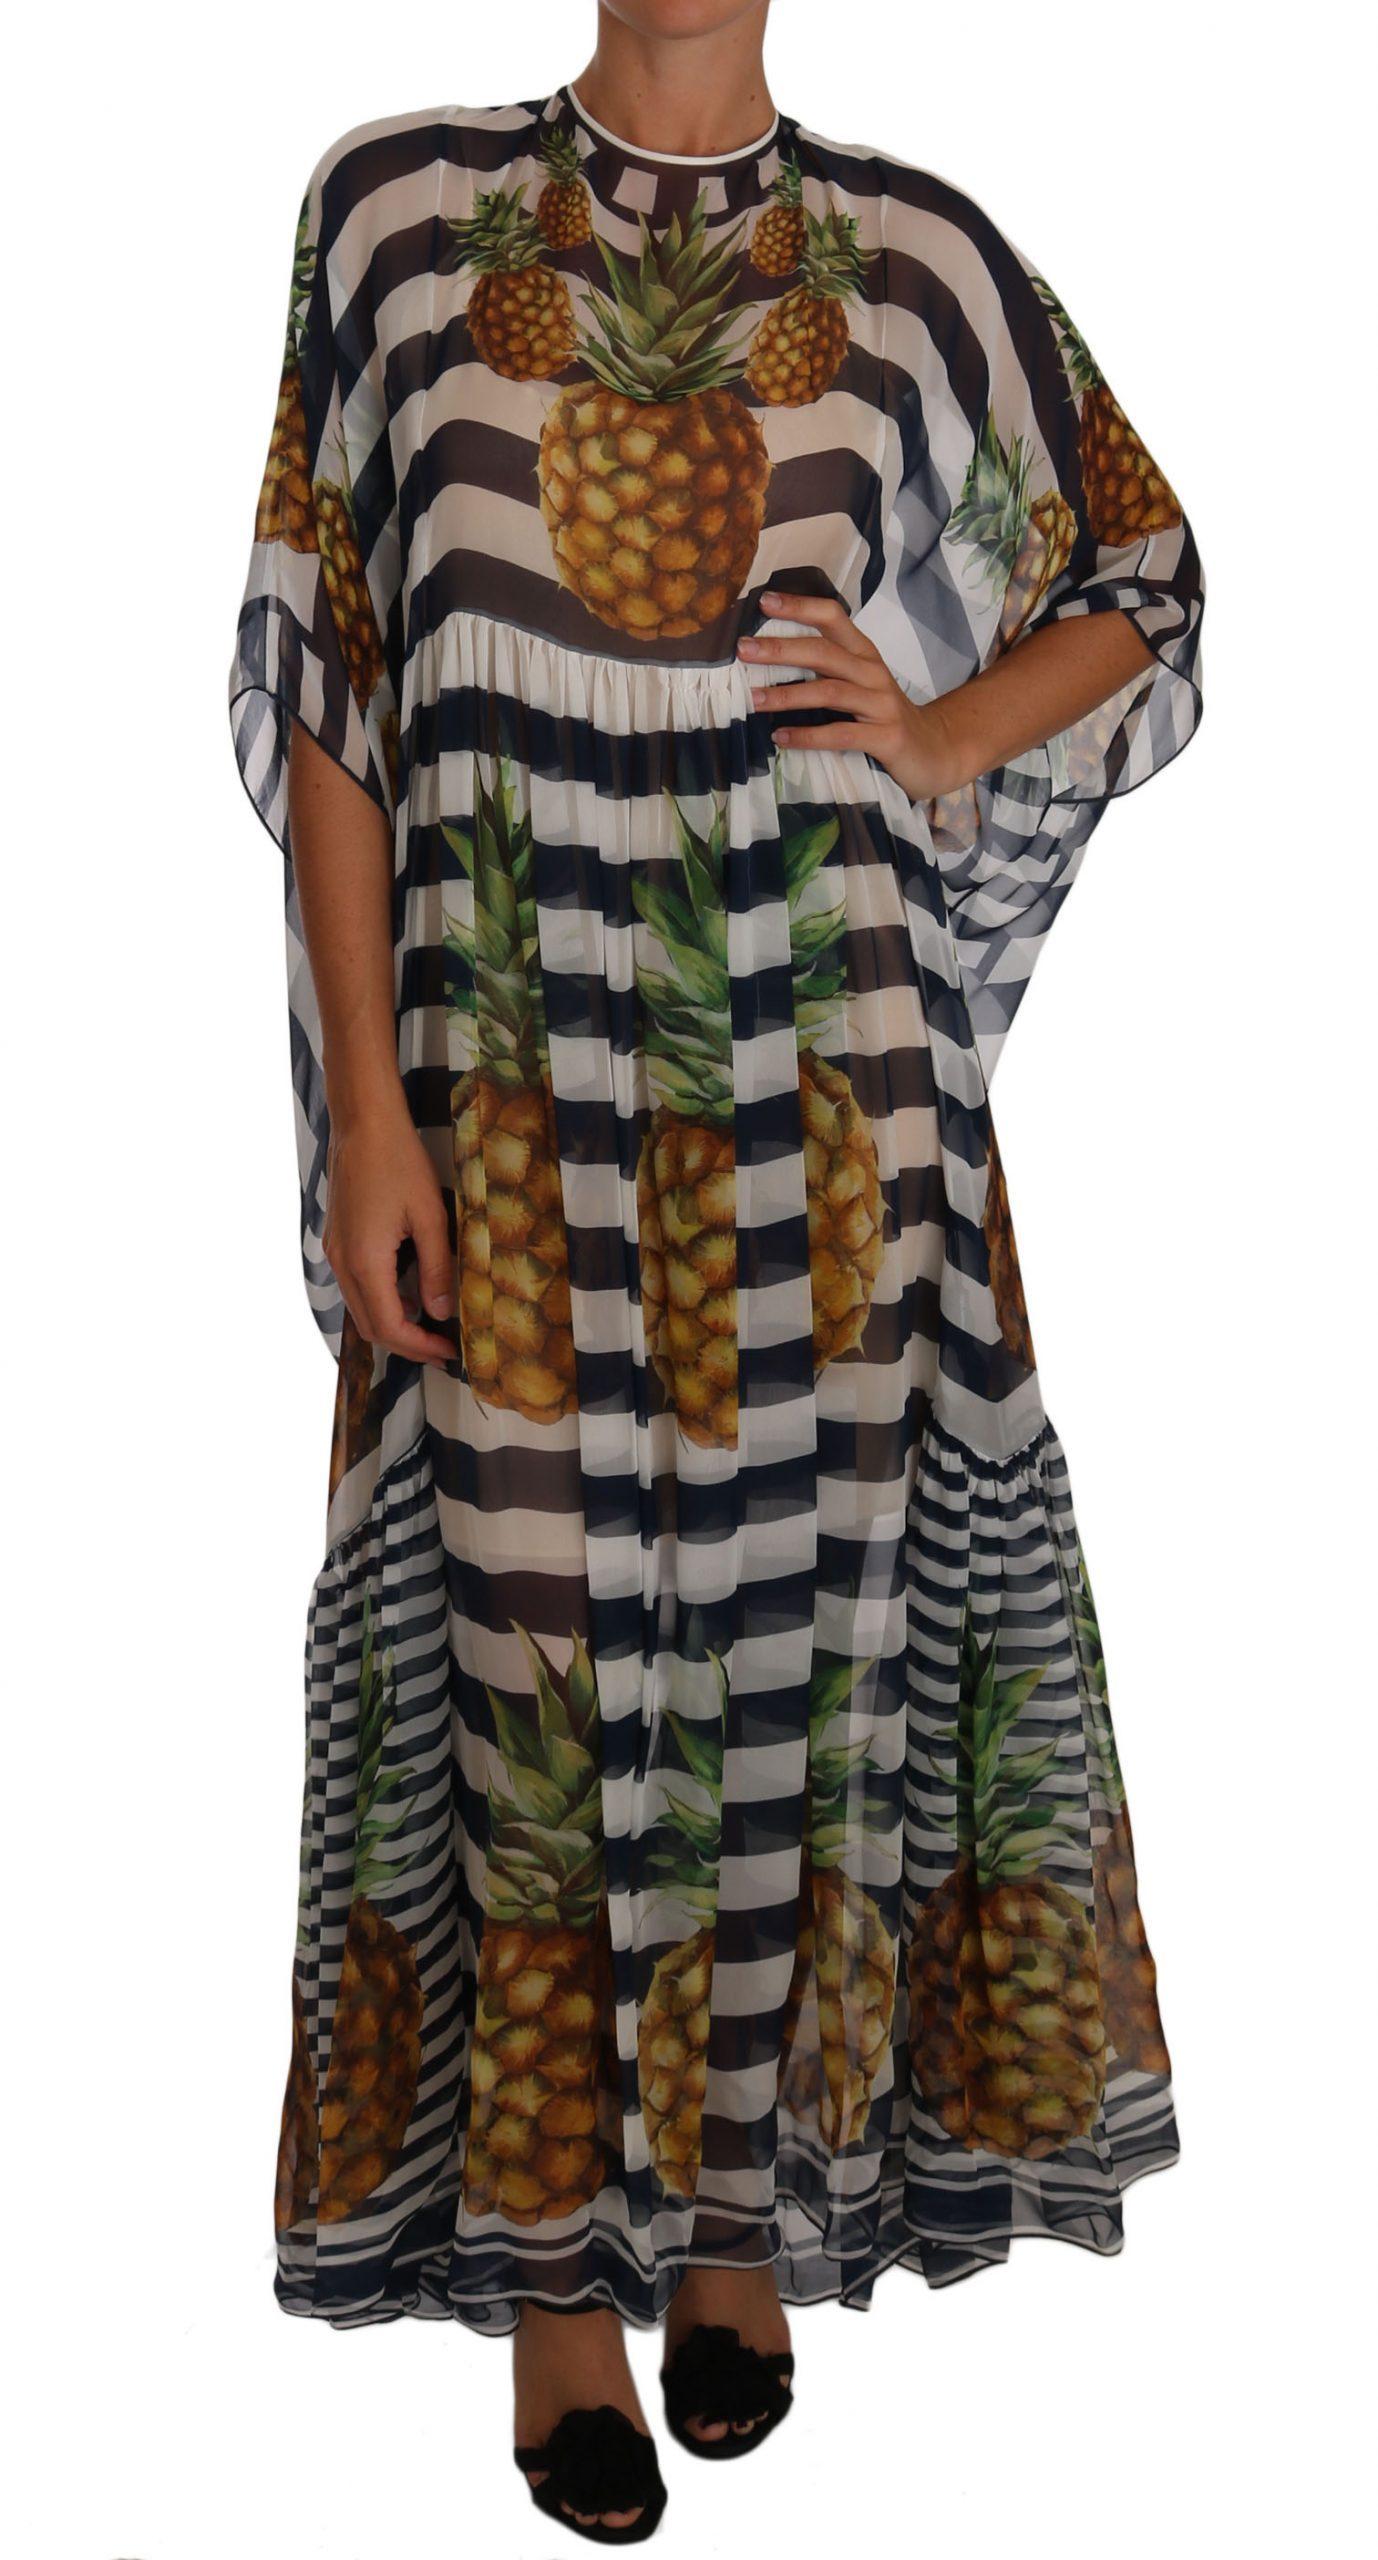 Dolce & Gabbana Women's Silk Striped Pineapple Tunic Dress Blue DR1472 - IT38|XS